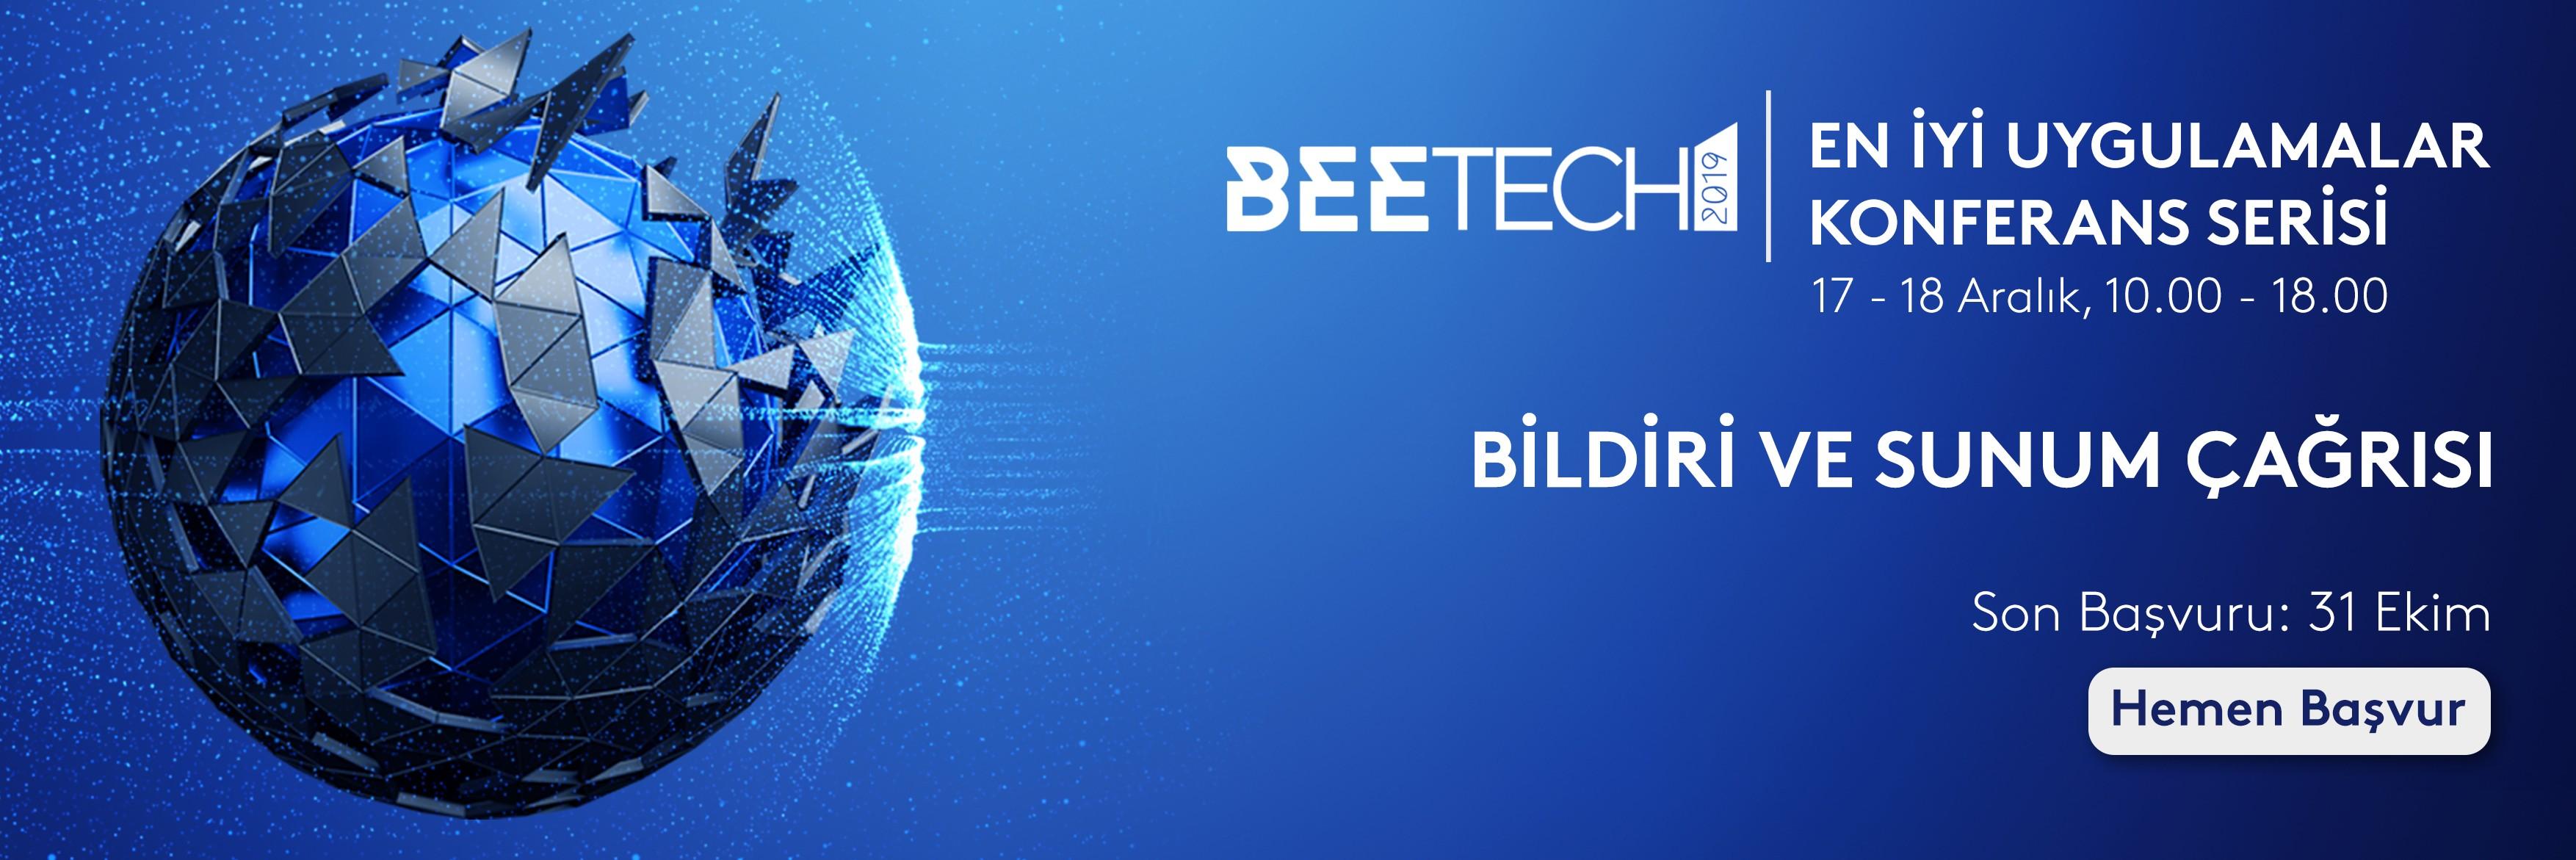 BEETECH